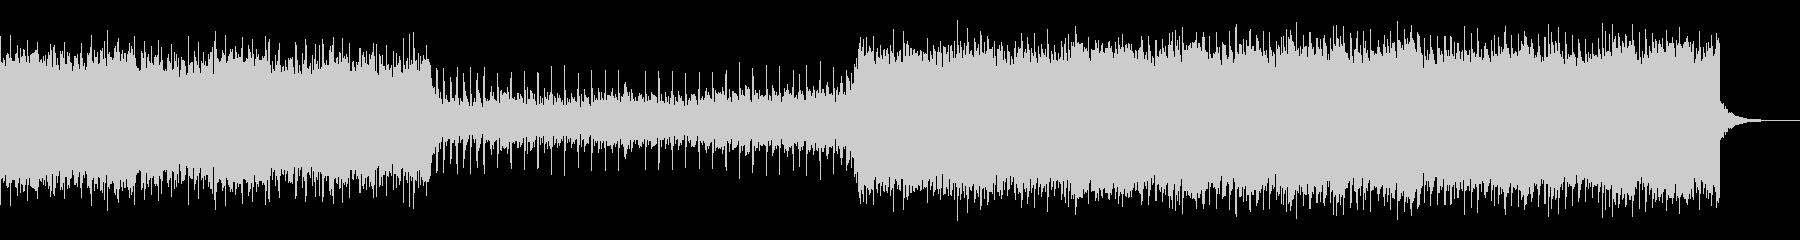 80's風のエレクトロBGMの未再生の波形